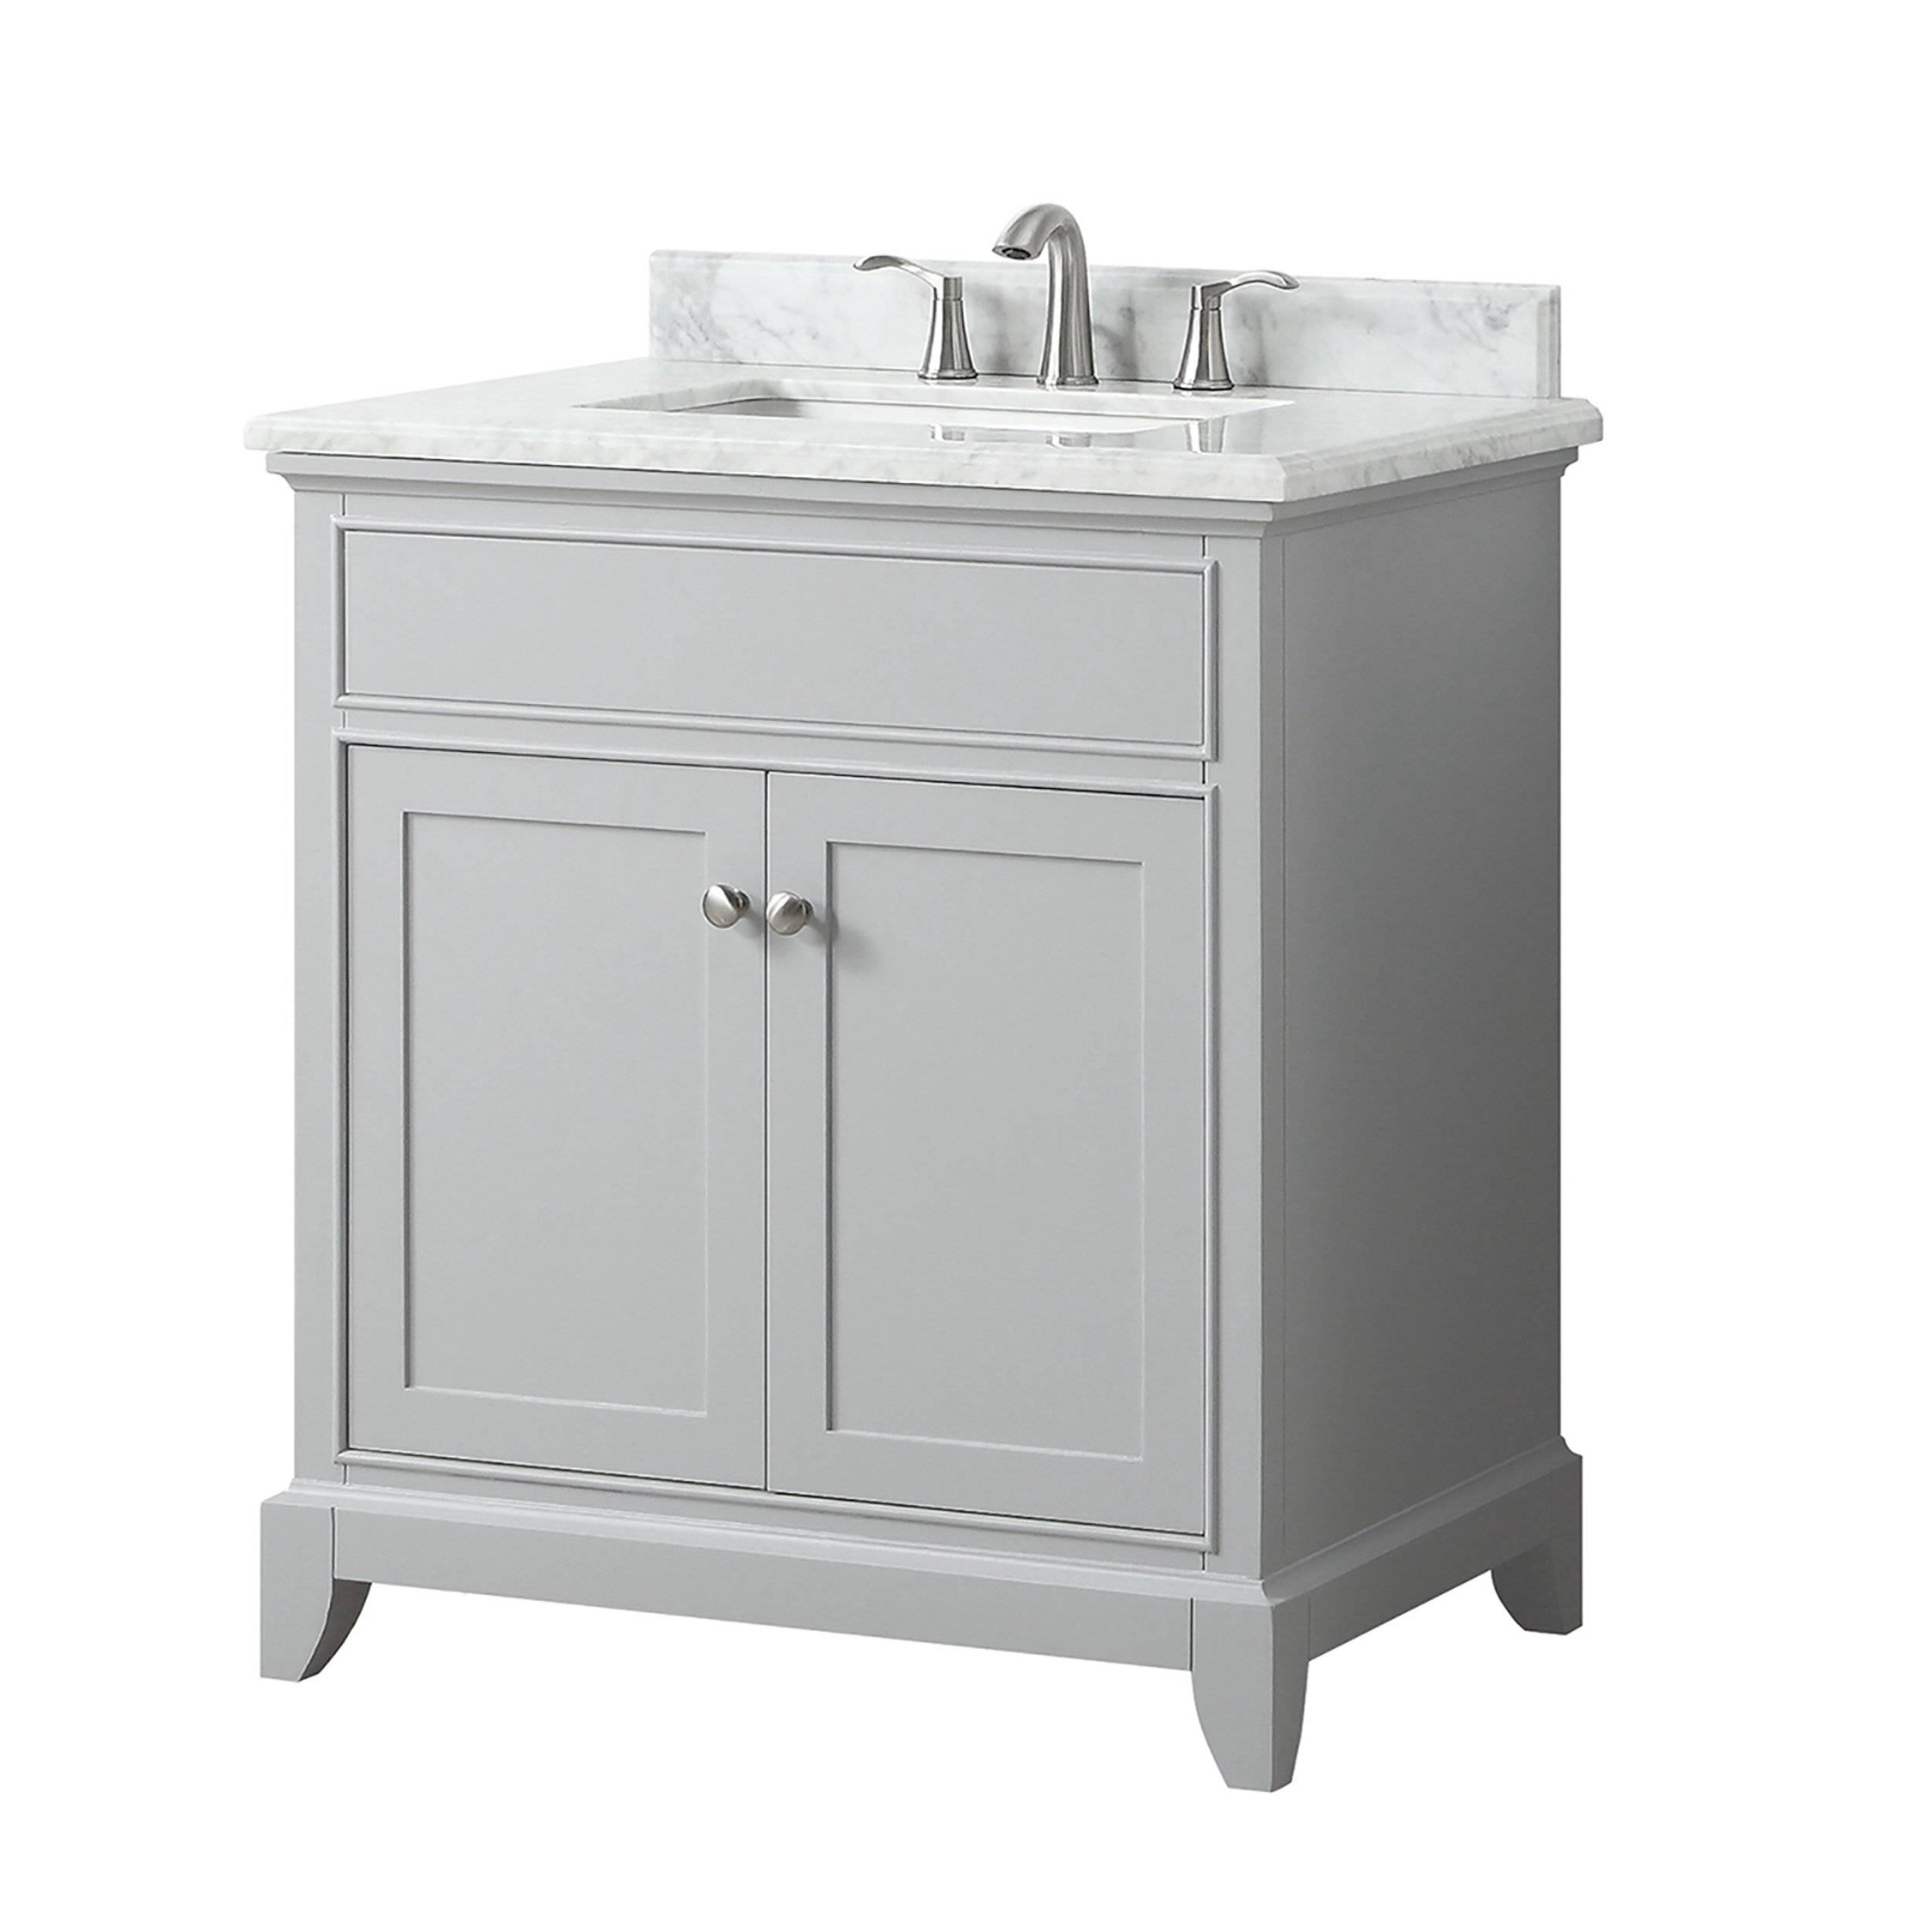 Aurora 25 In Vanity With Carrara Marble Top 25in 100821453 Floor And Decor